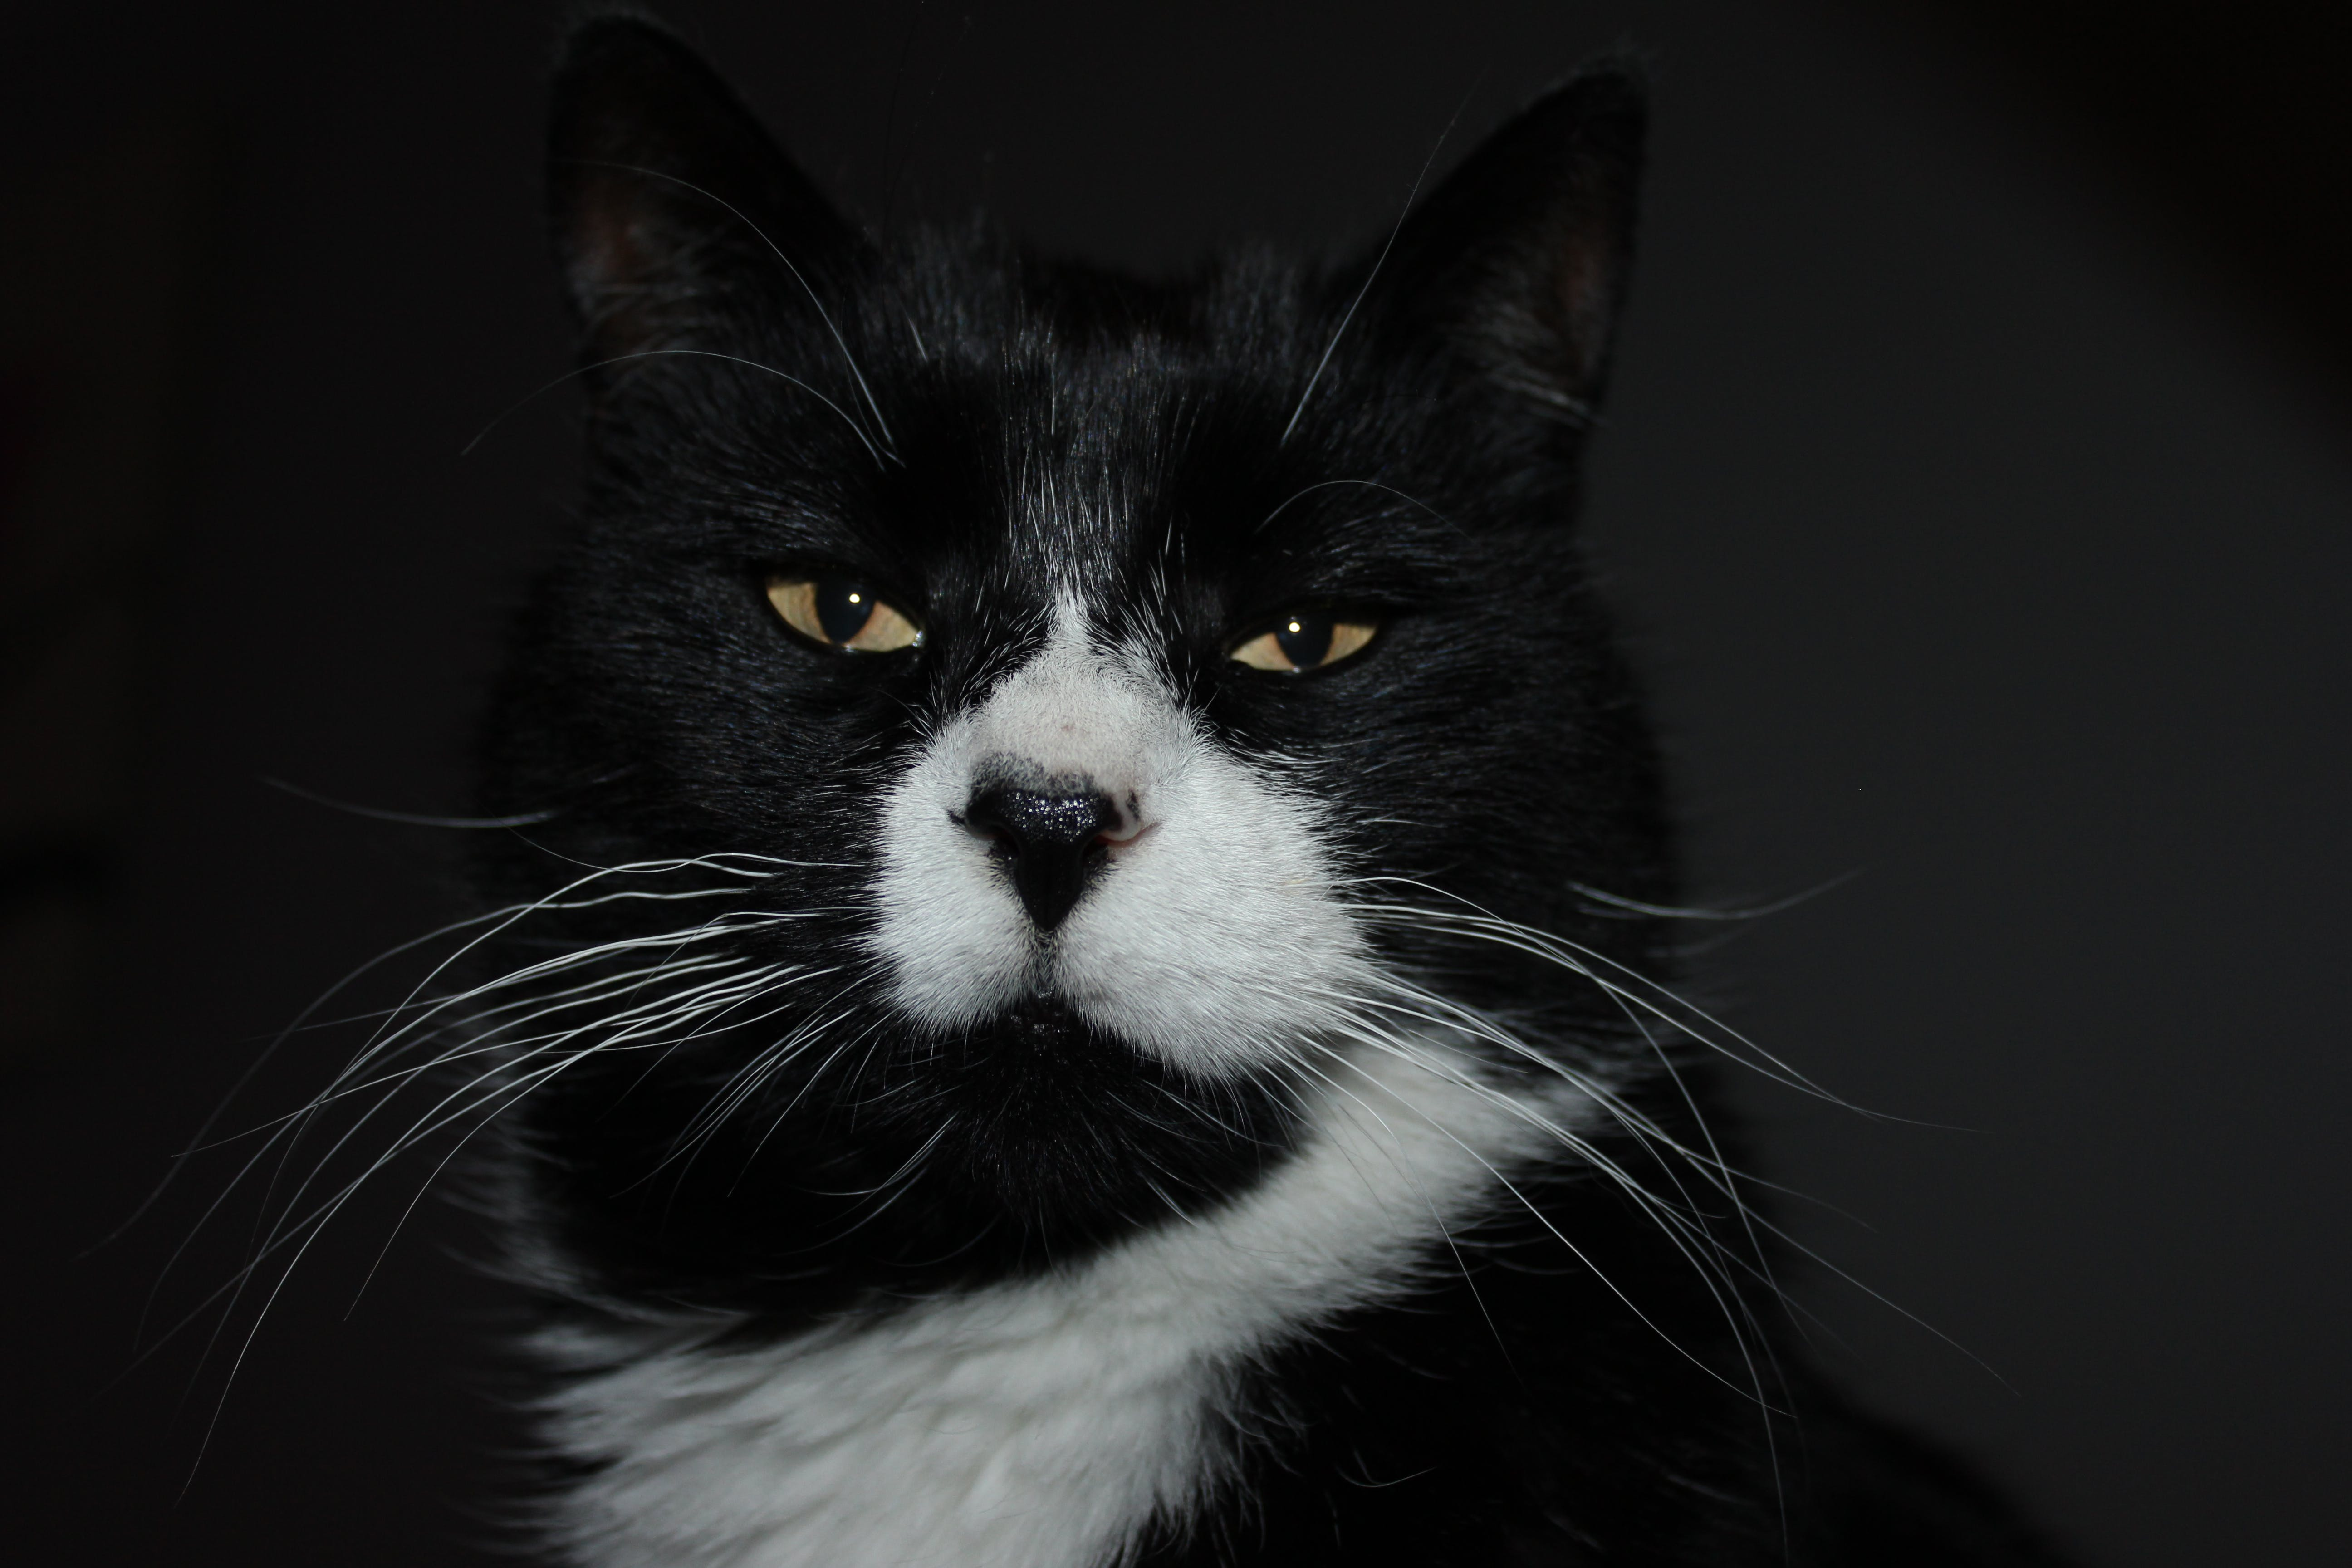 Free stock photo of black cat, cat